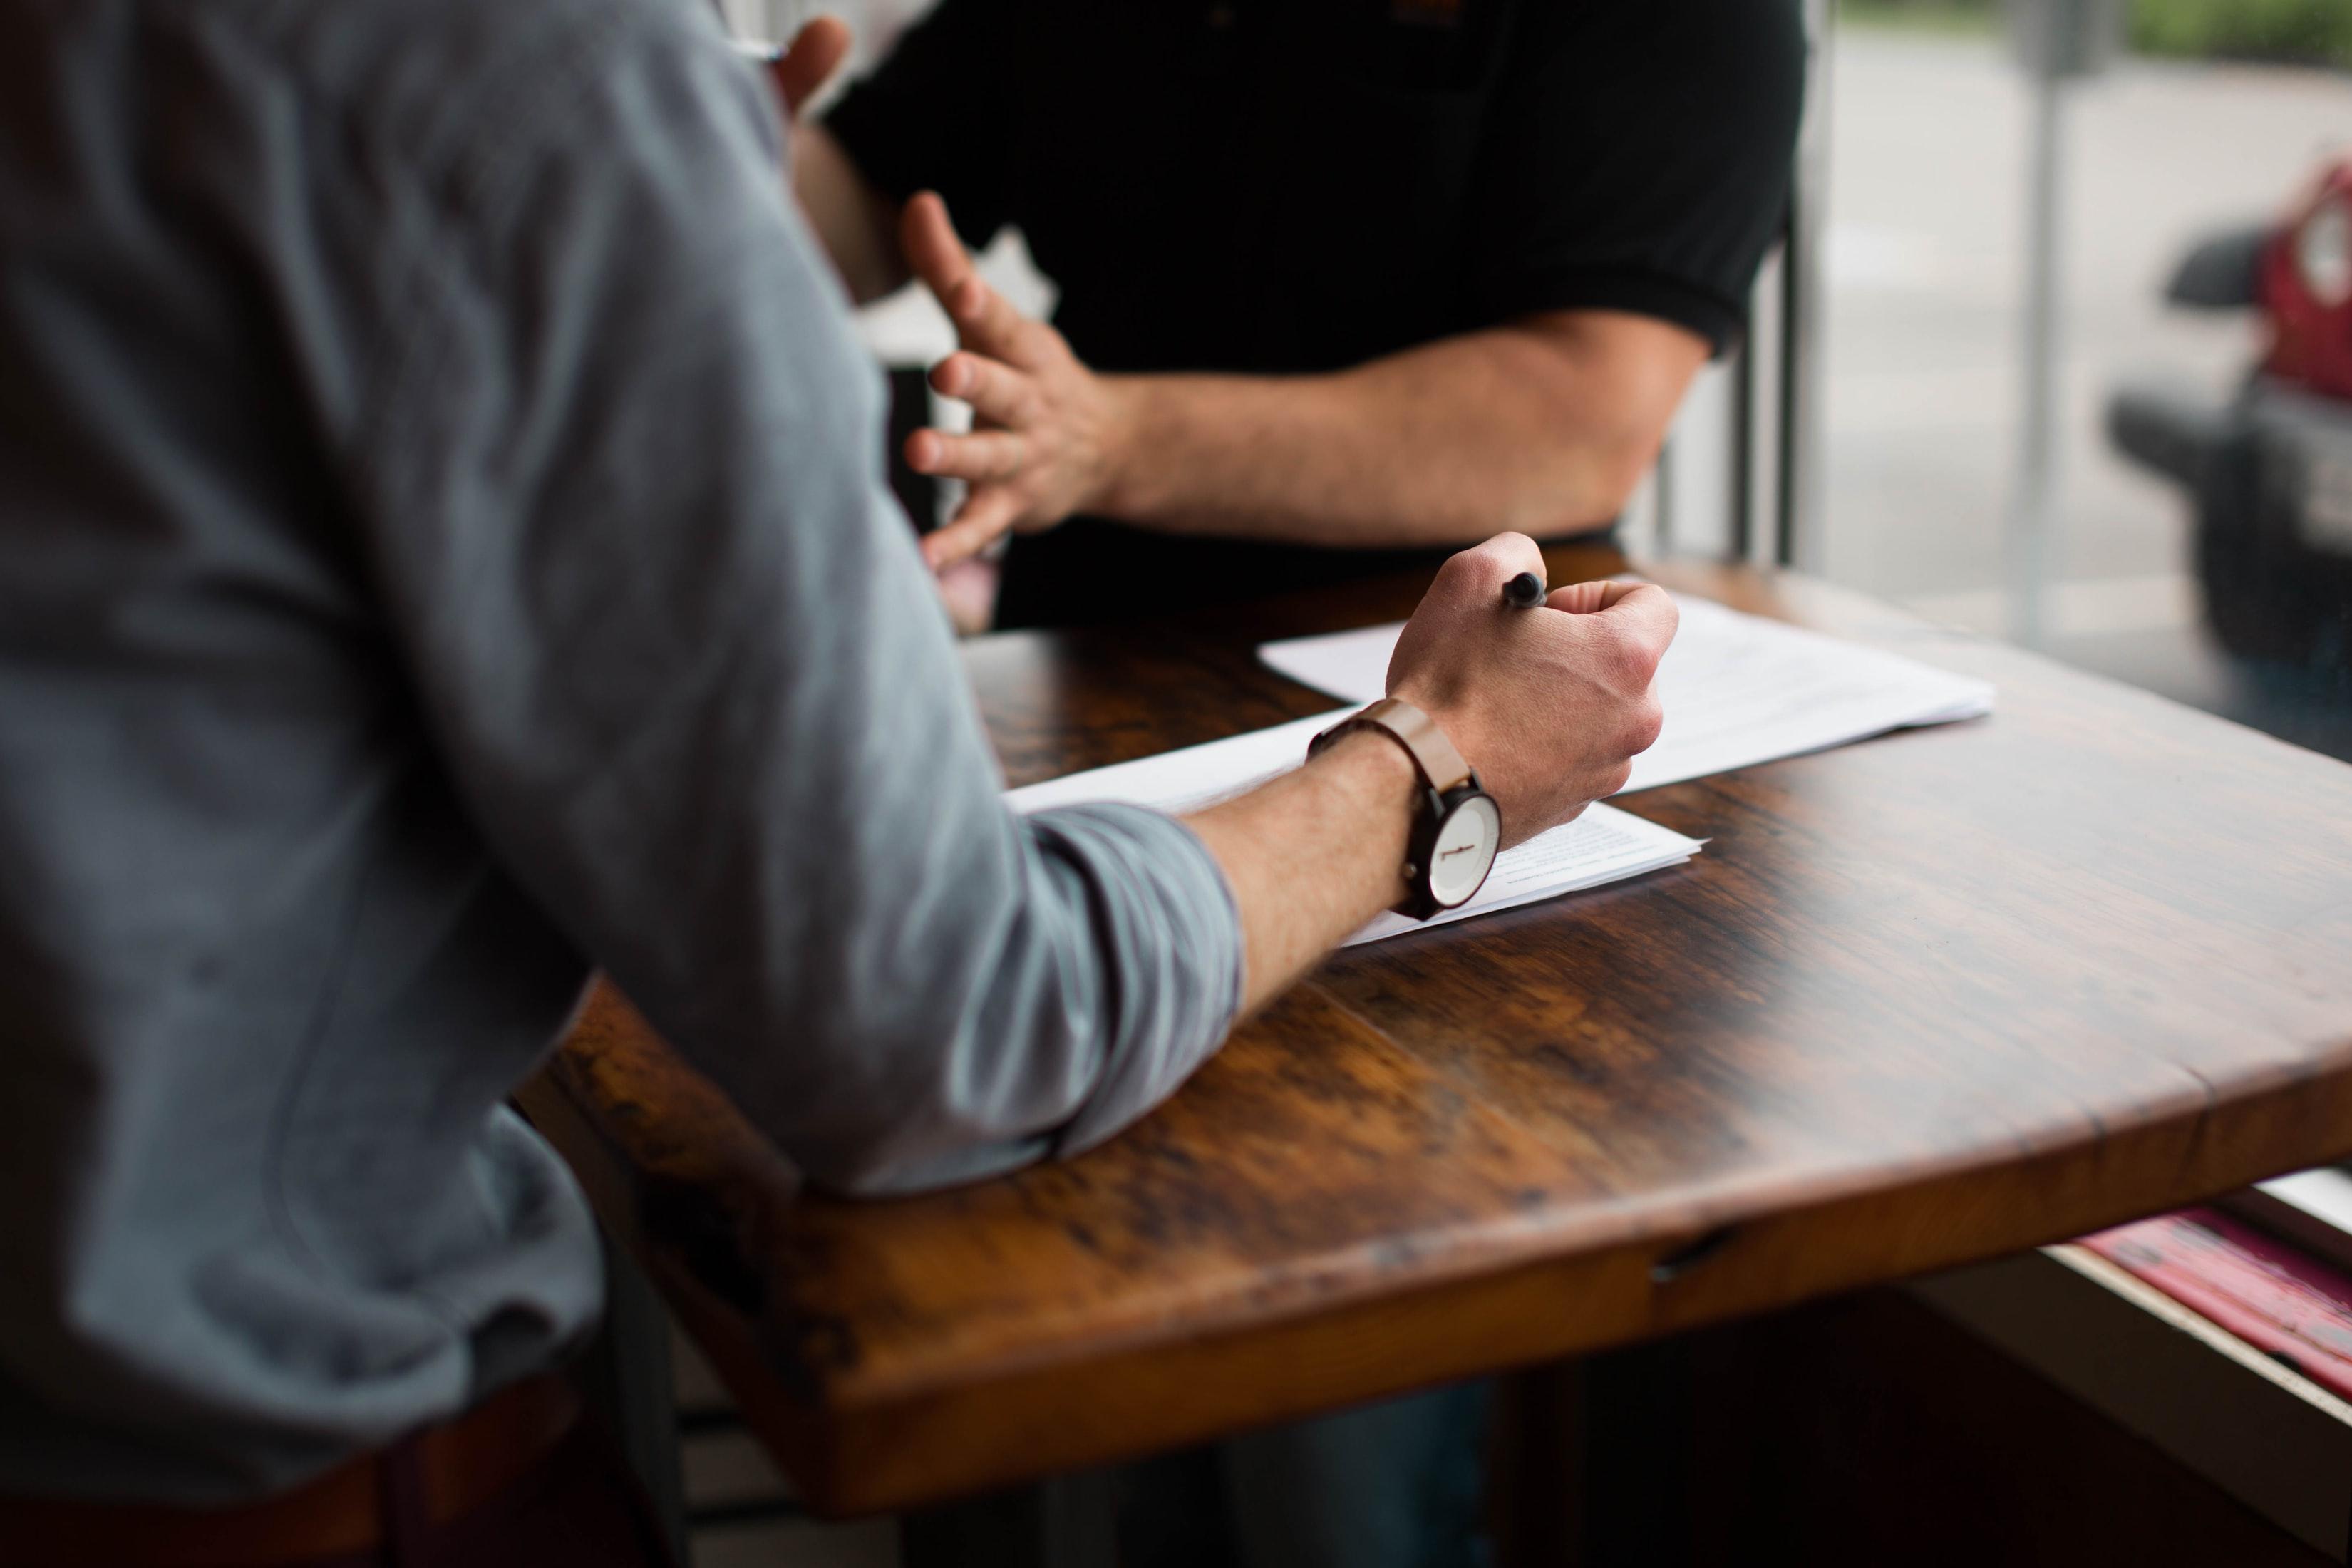 People planning on desk